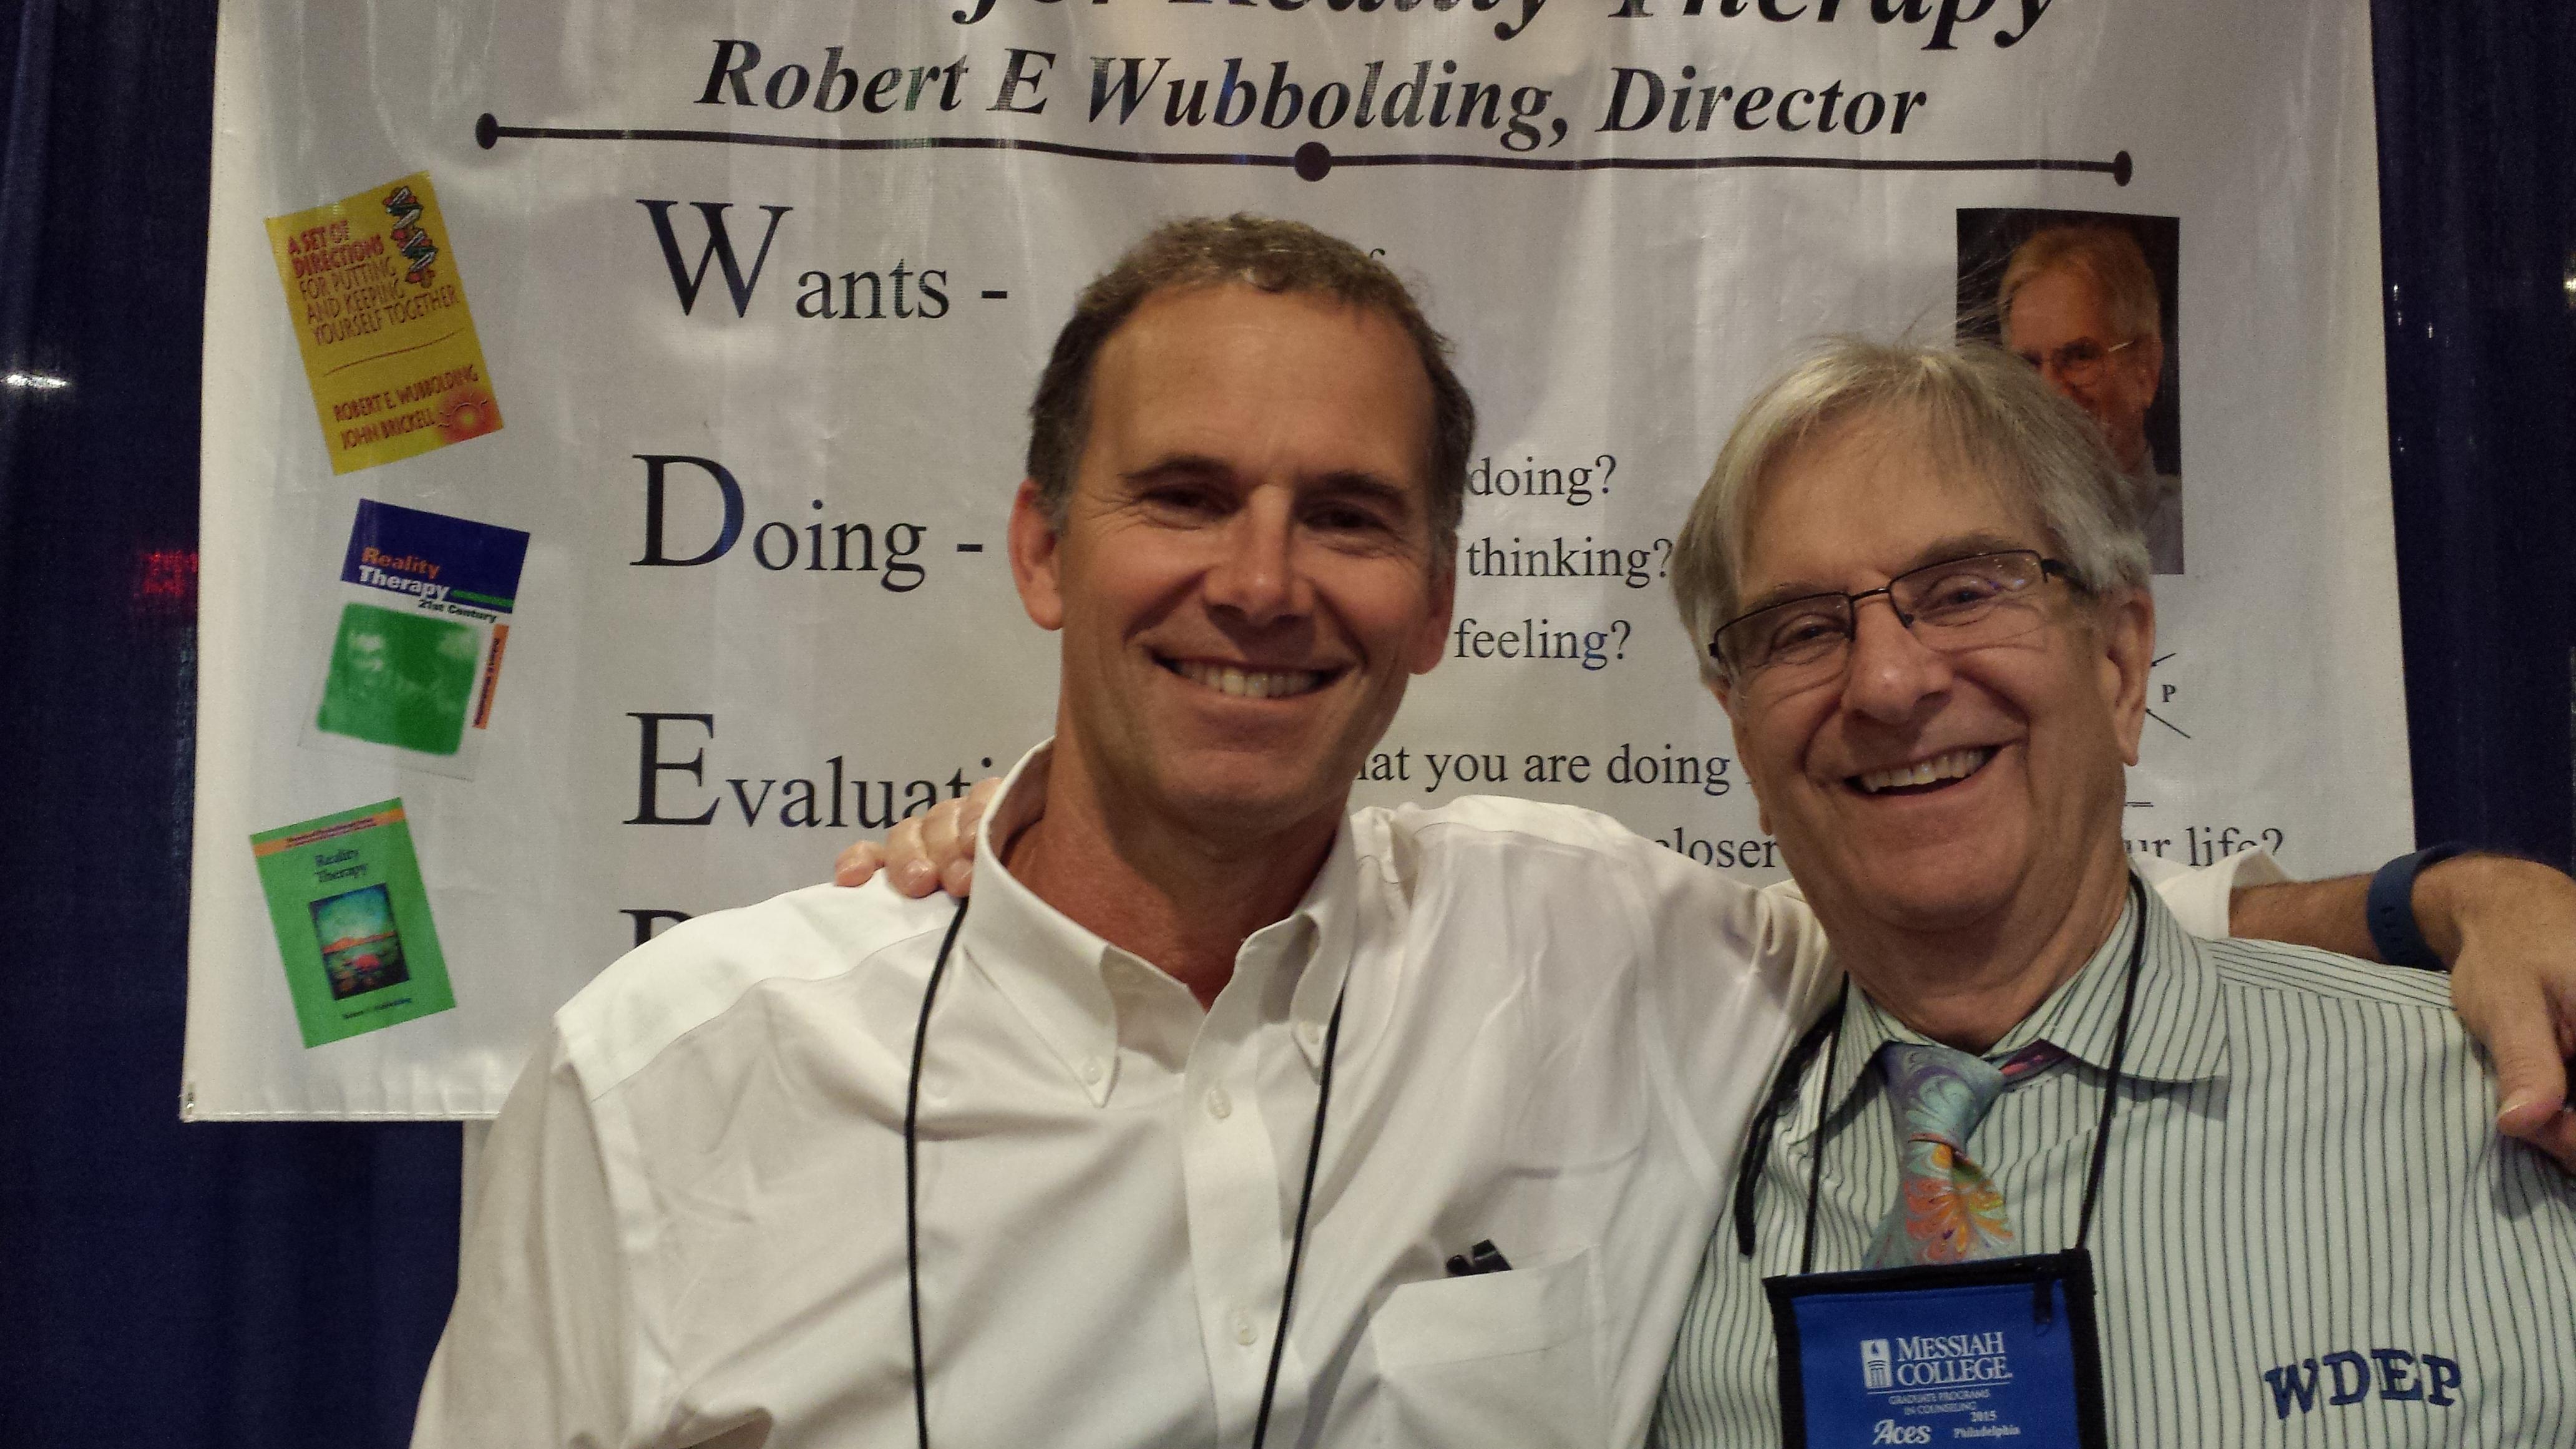 With Wubbolding